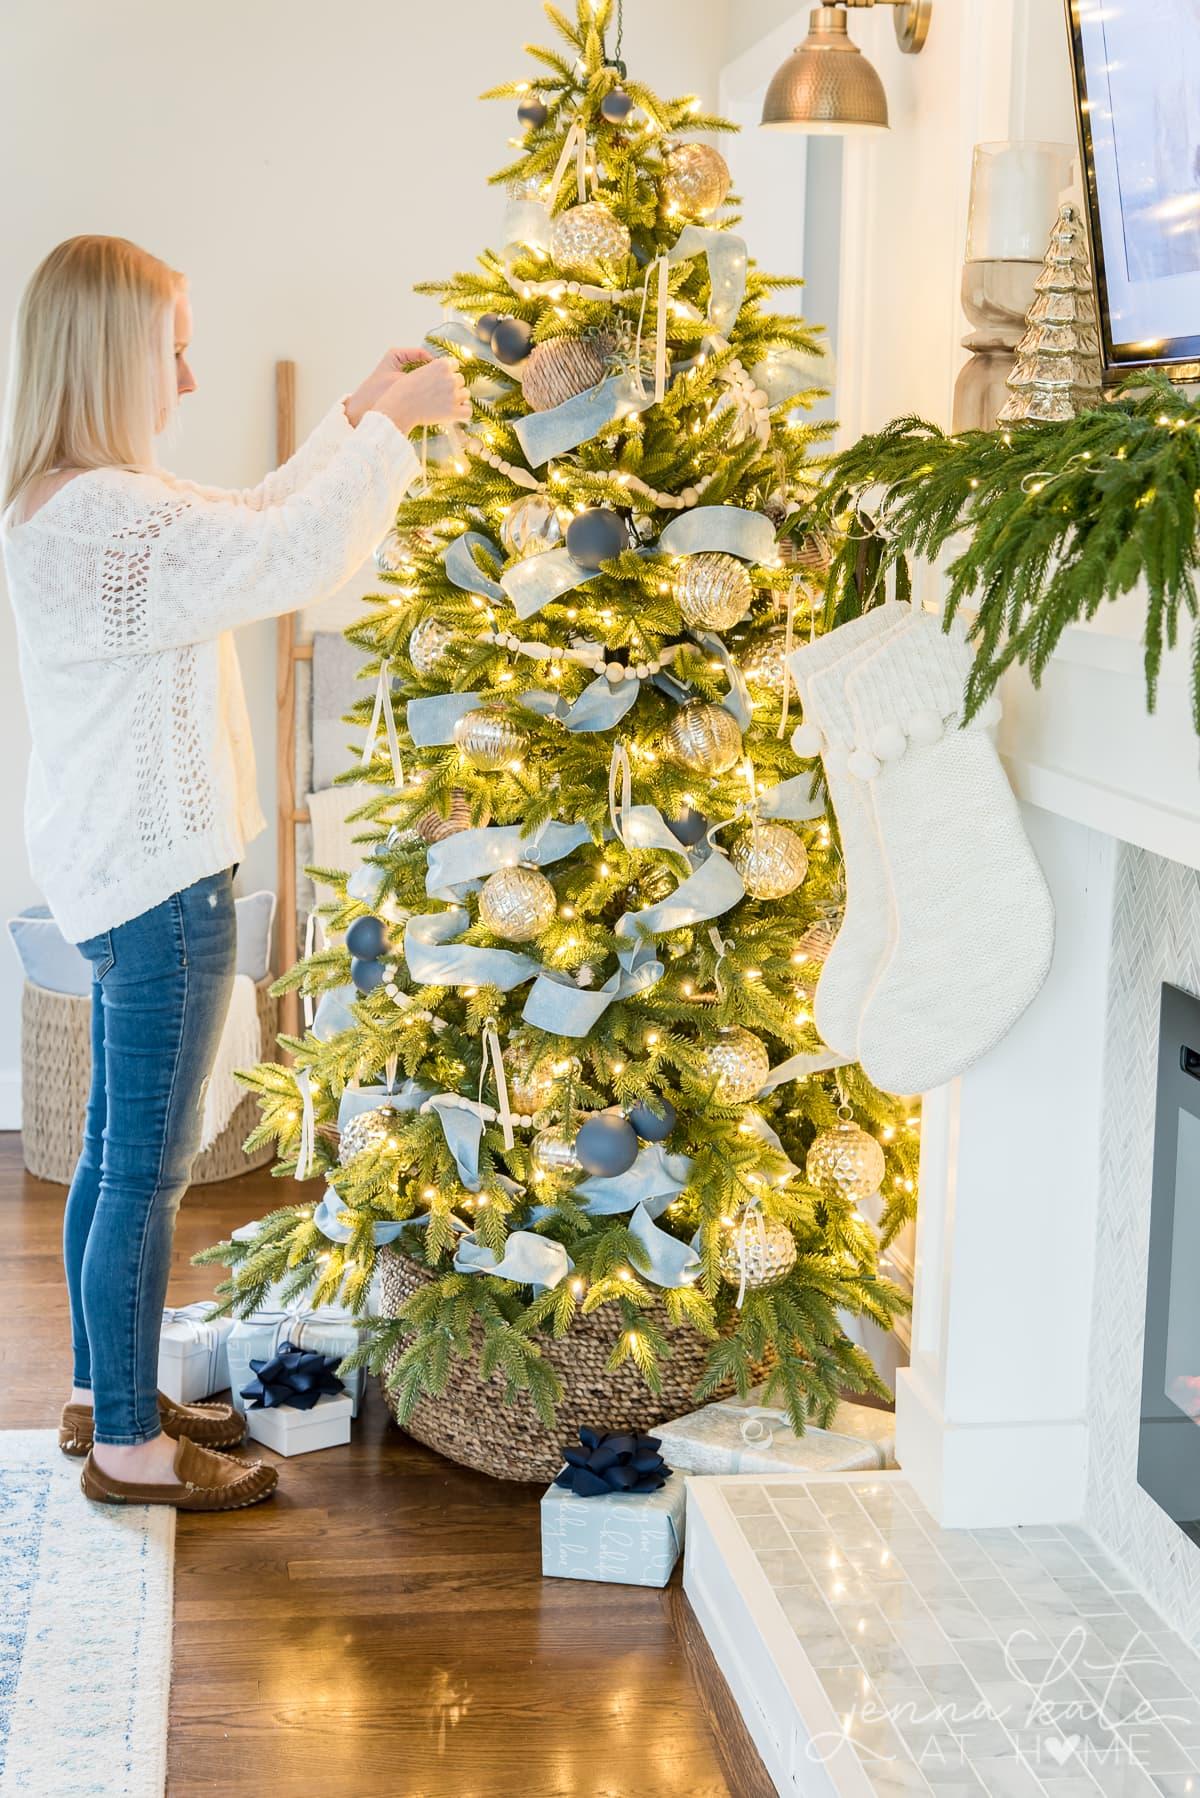 Woman hanging ribbon on the Christmas tree